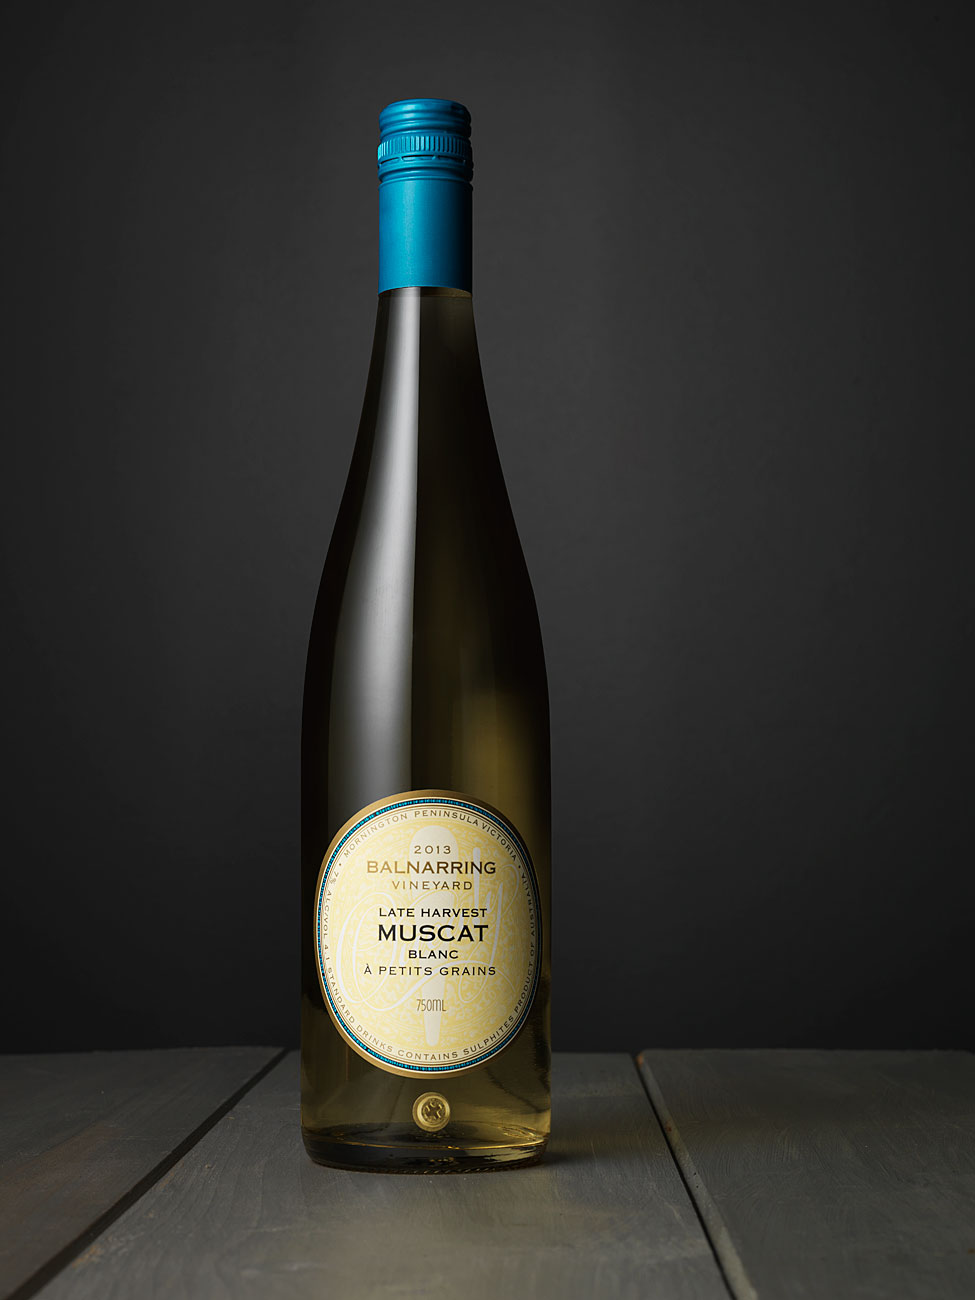 wine-bottle-photography-ijproductions7.jpg